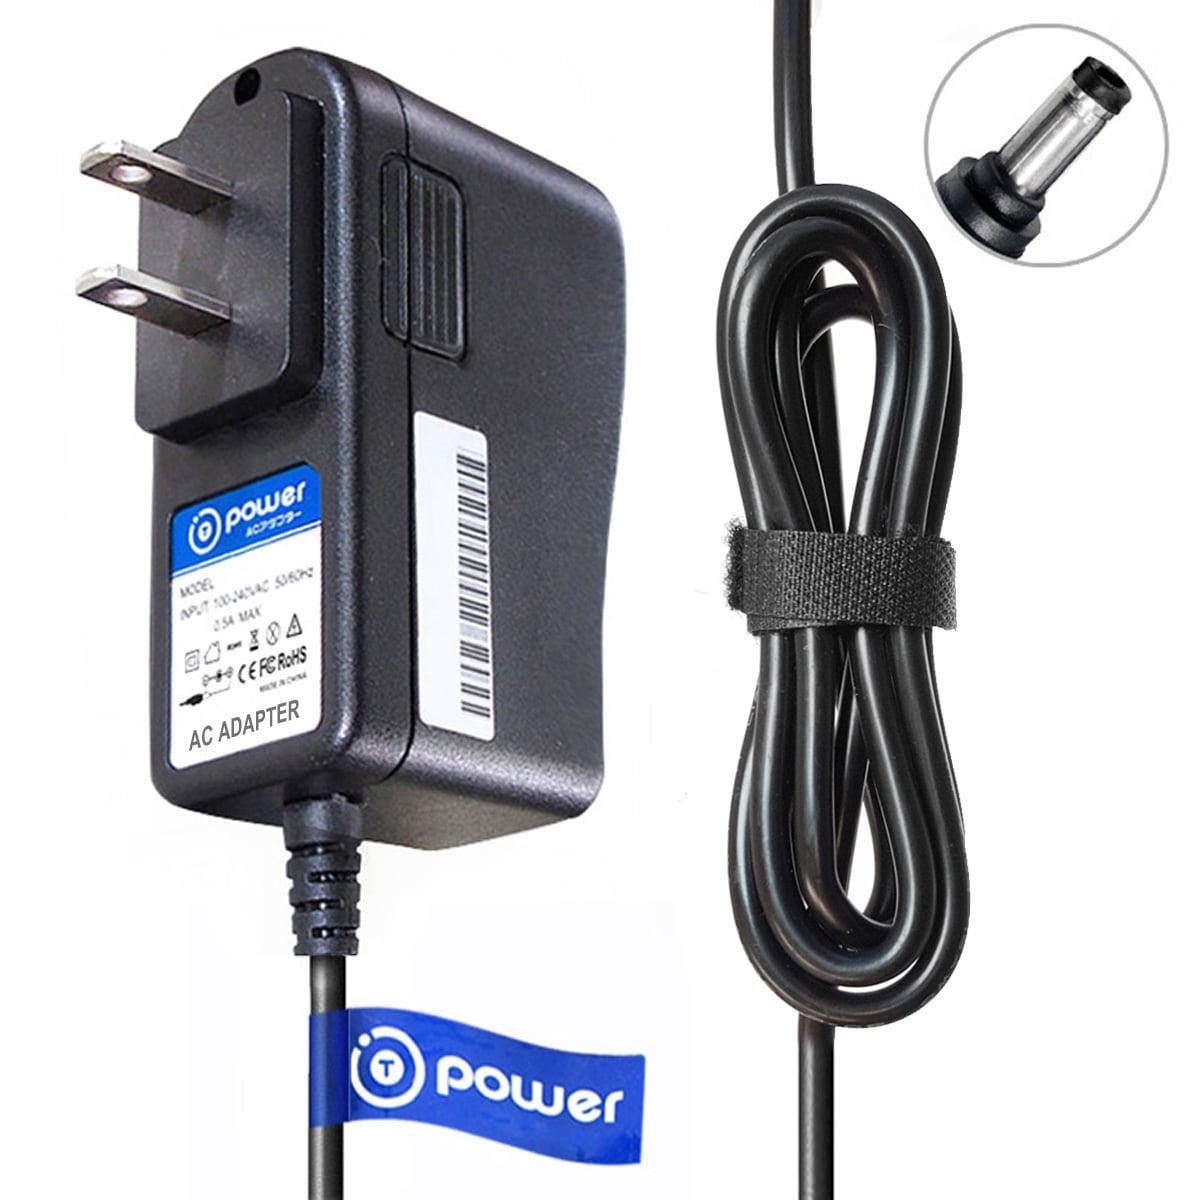 T-Power 12v AC adapter Charger For Comcast Xfinity Motorola ARRIS Surfboard SB6190 SB6183 SBG6700AC SBG6580 SB6120 SB6121 SB6141 SB6180 Sbg6580, SB6183 SBG6782 SBG6782-AC SBG901 900 Cable Modem dta-1